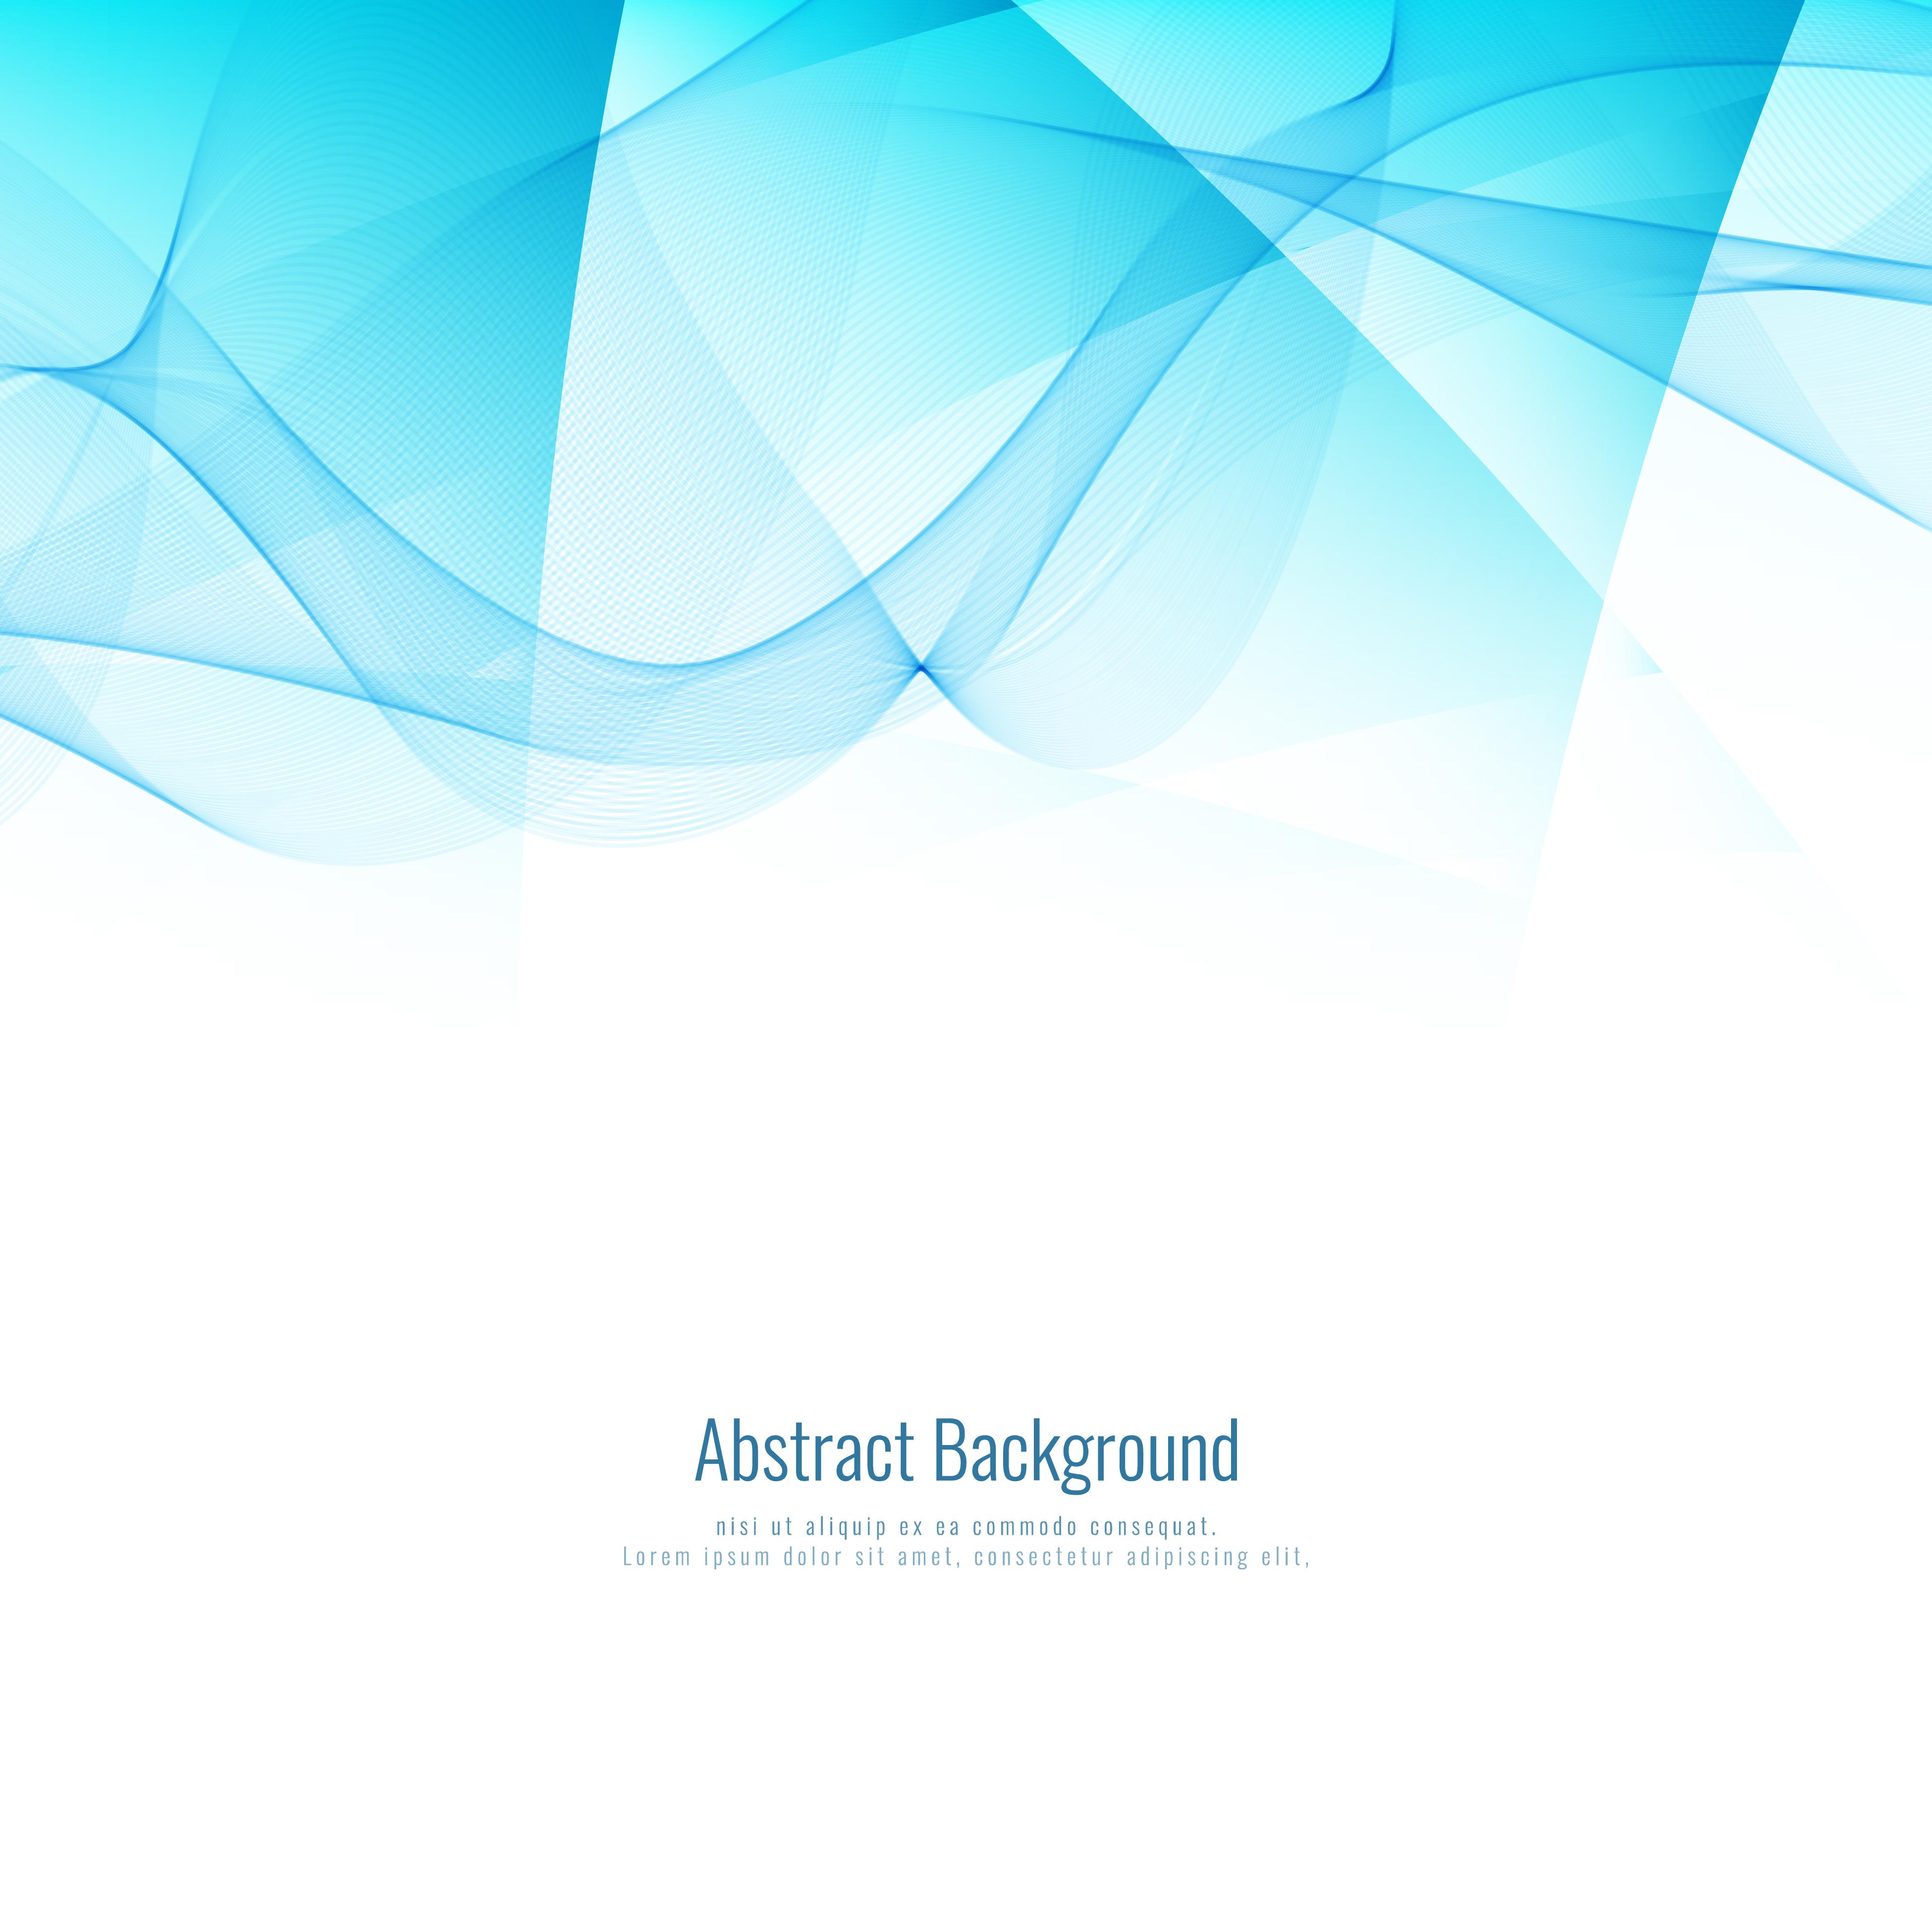 Abstract Blue Wavy Modern Geometric Background Design